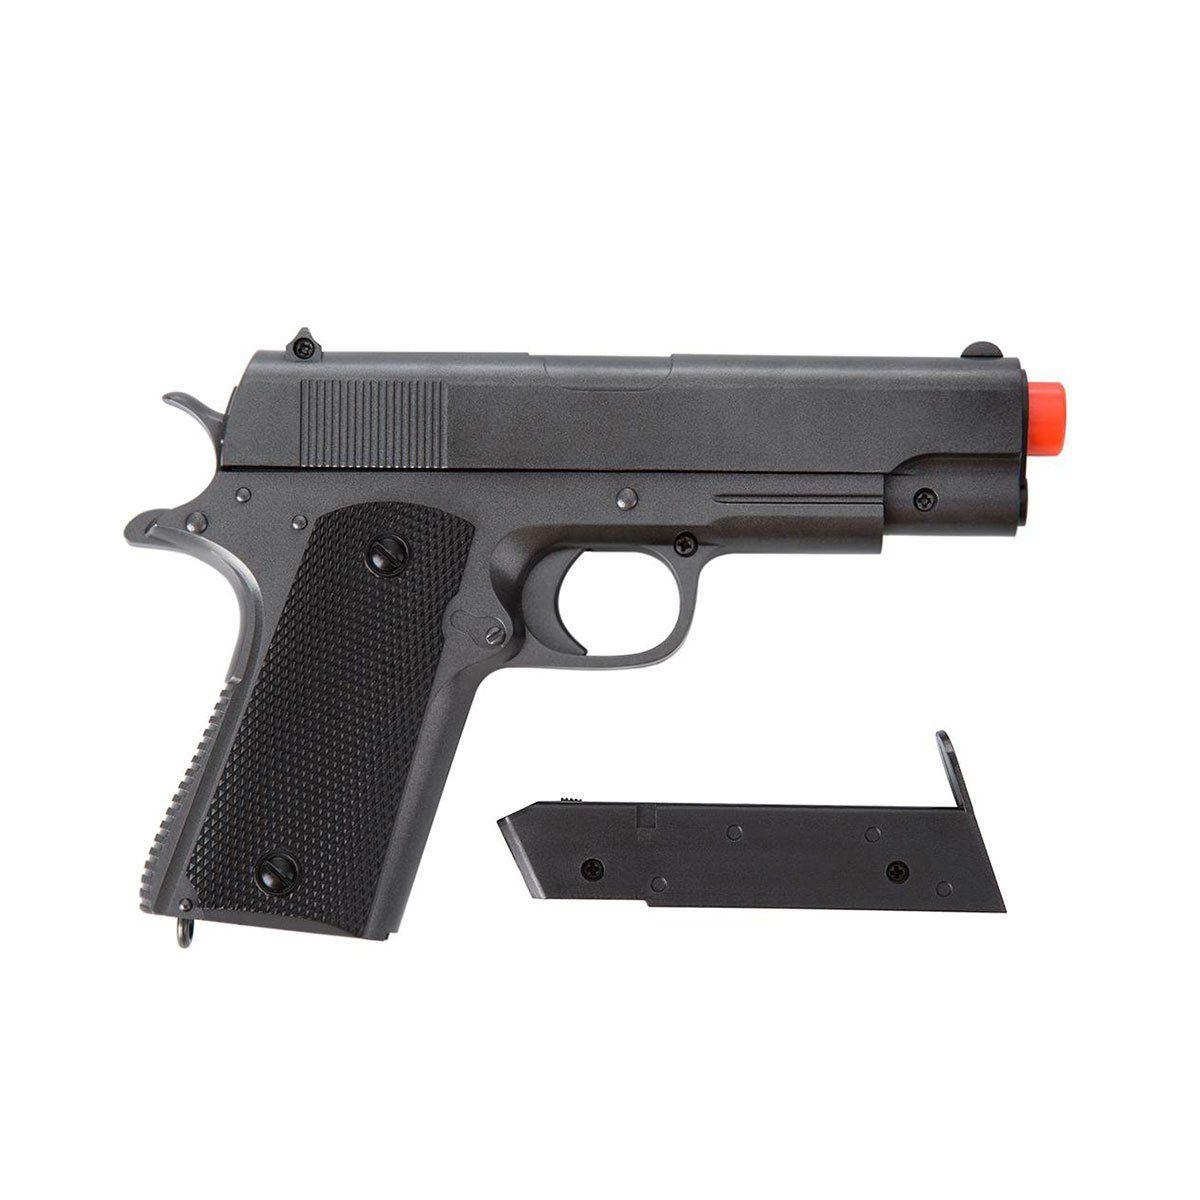 Pistola Airsoft Cyma ZM04 Calibre 6mm